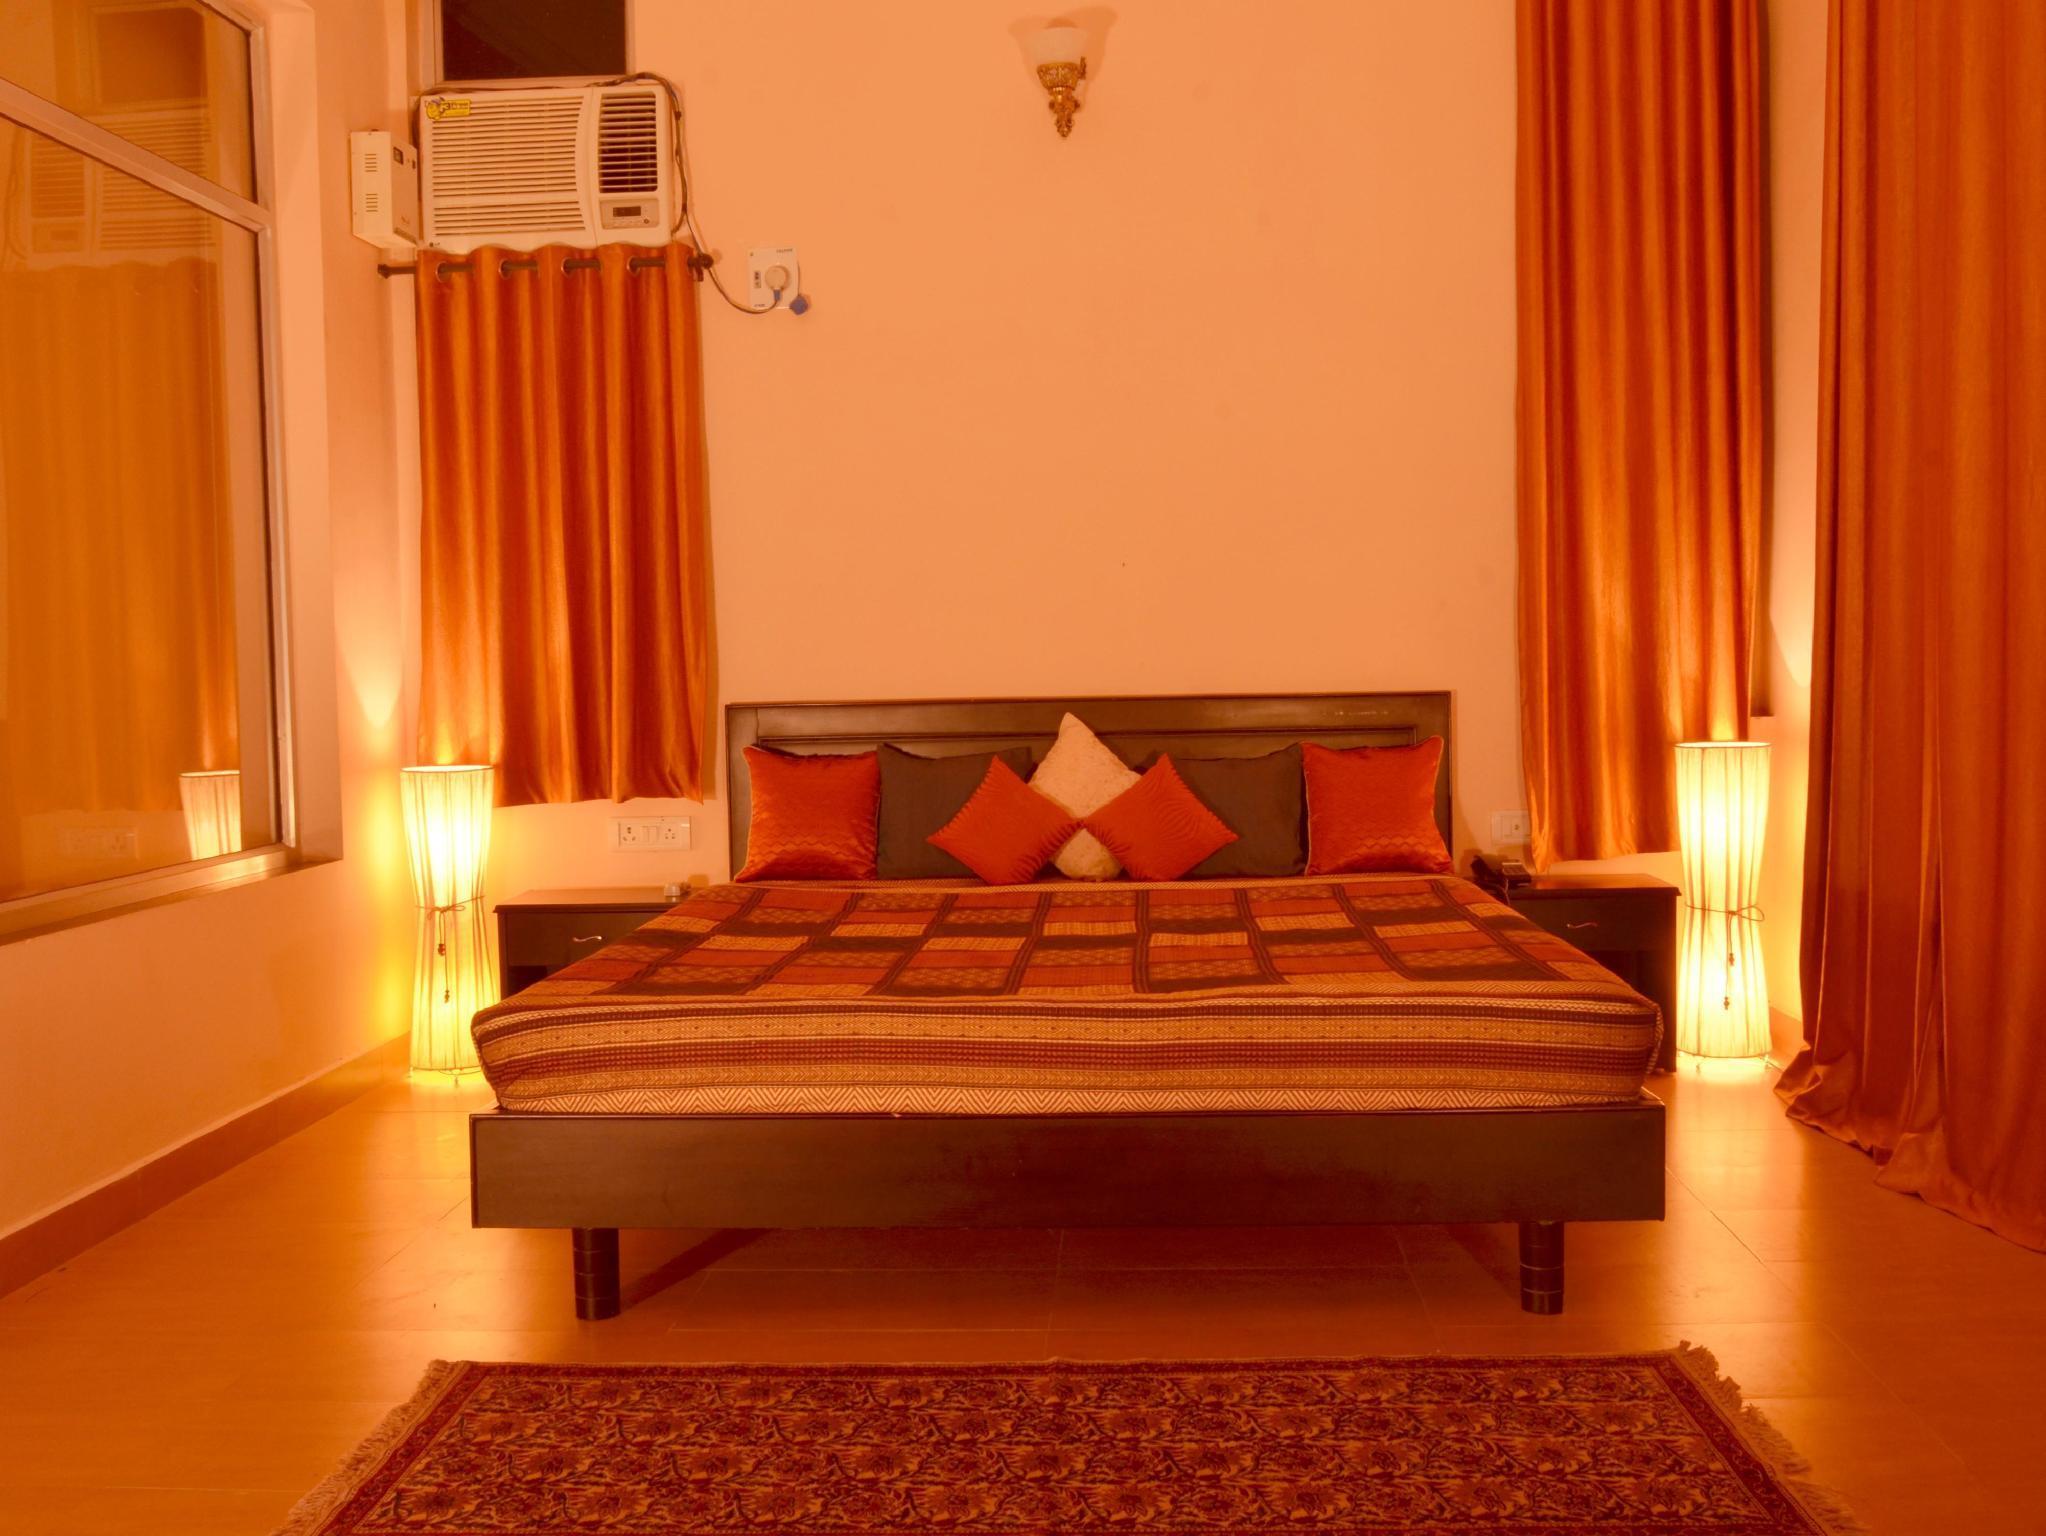 Satya Ashoka Resort Kanha India